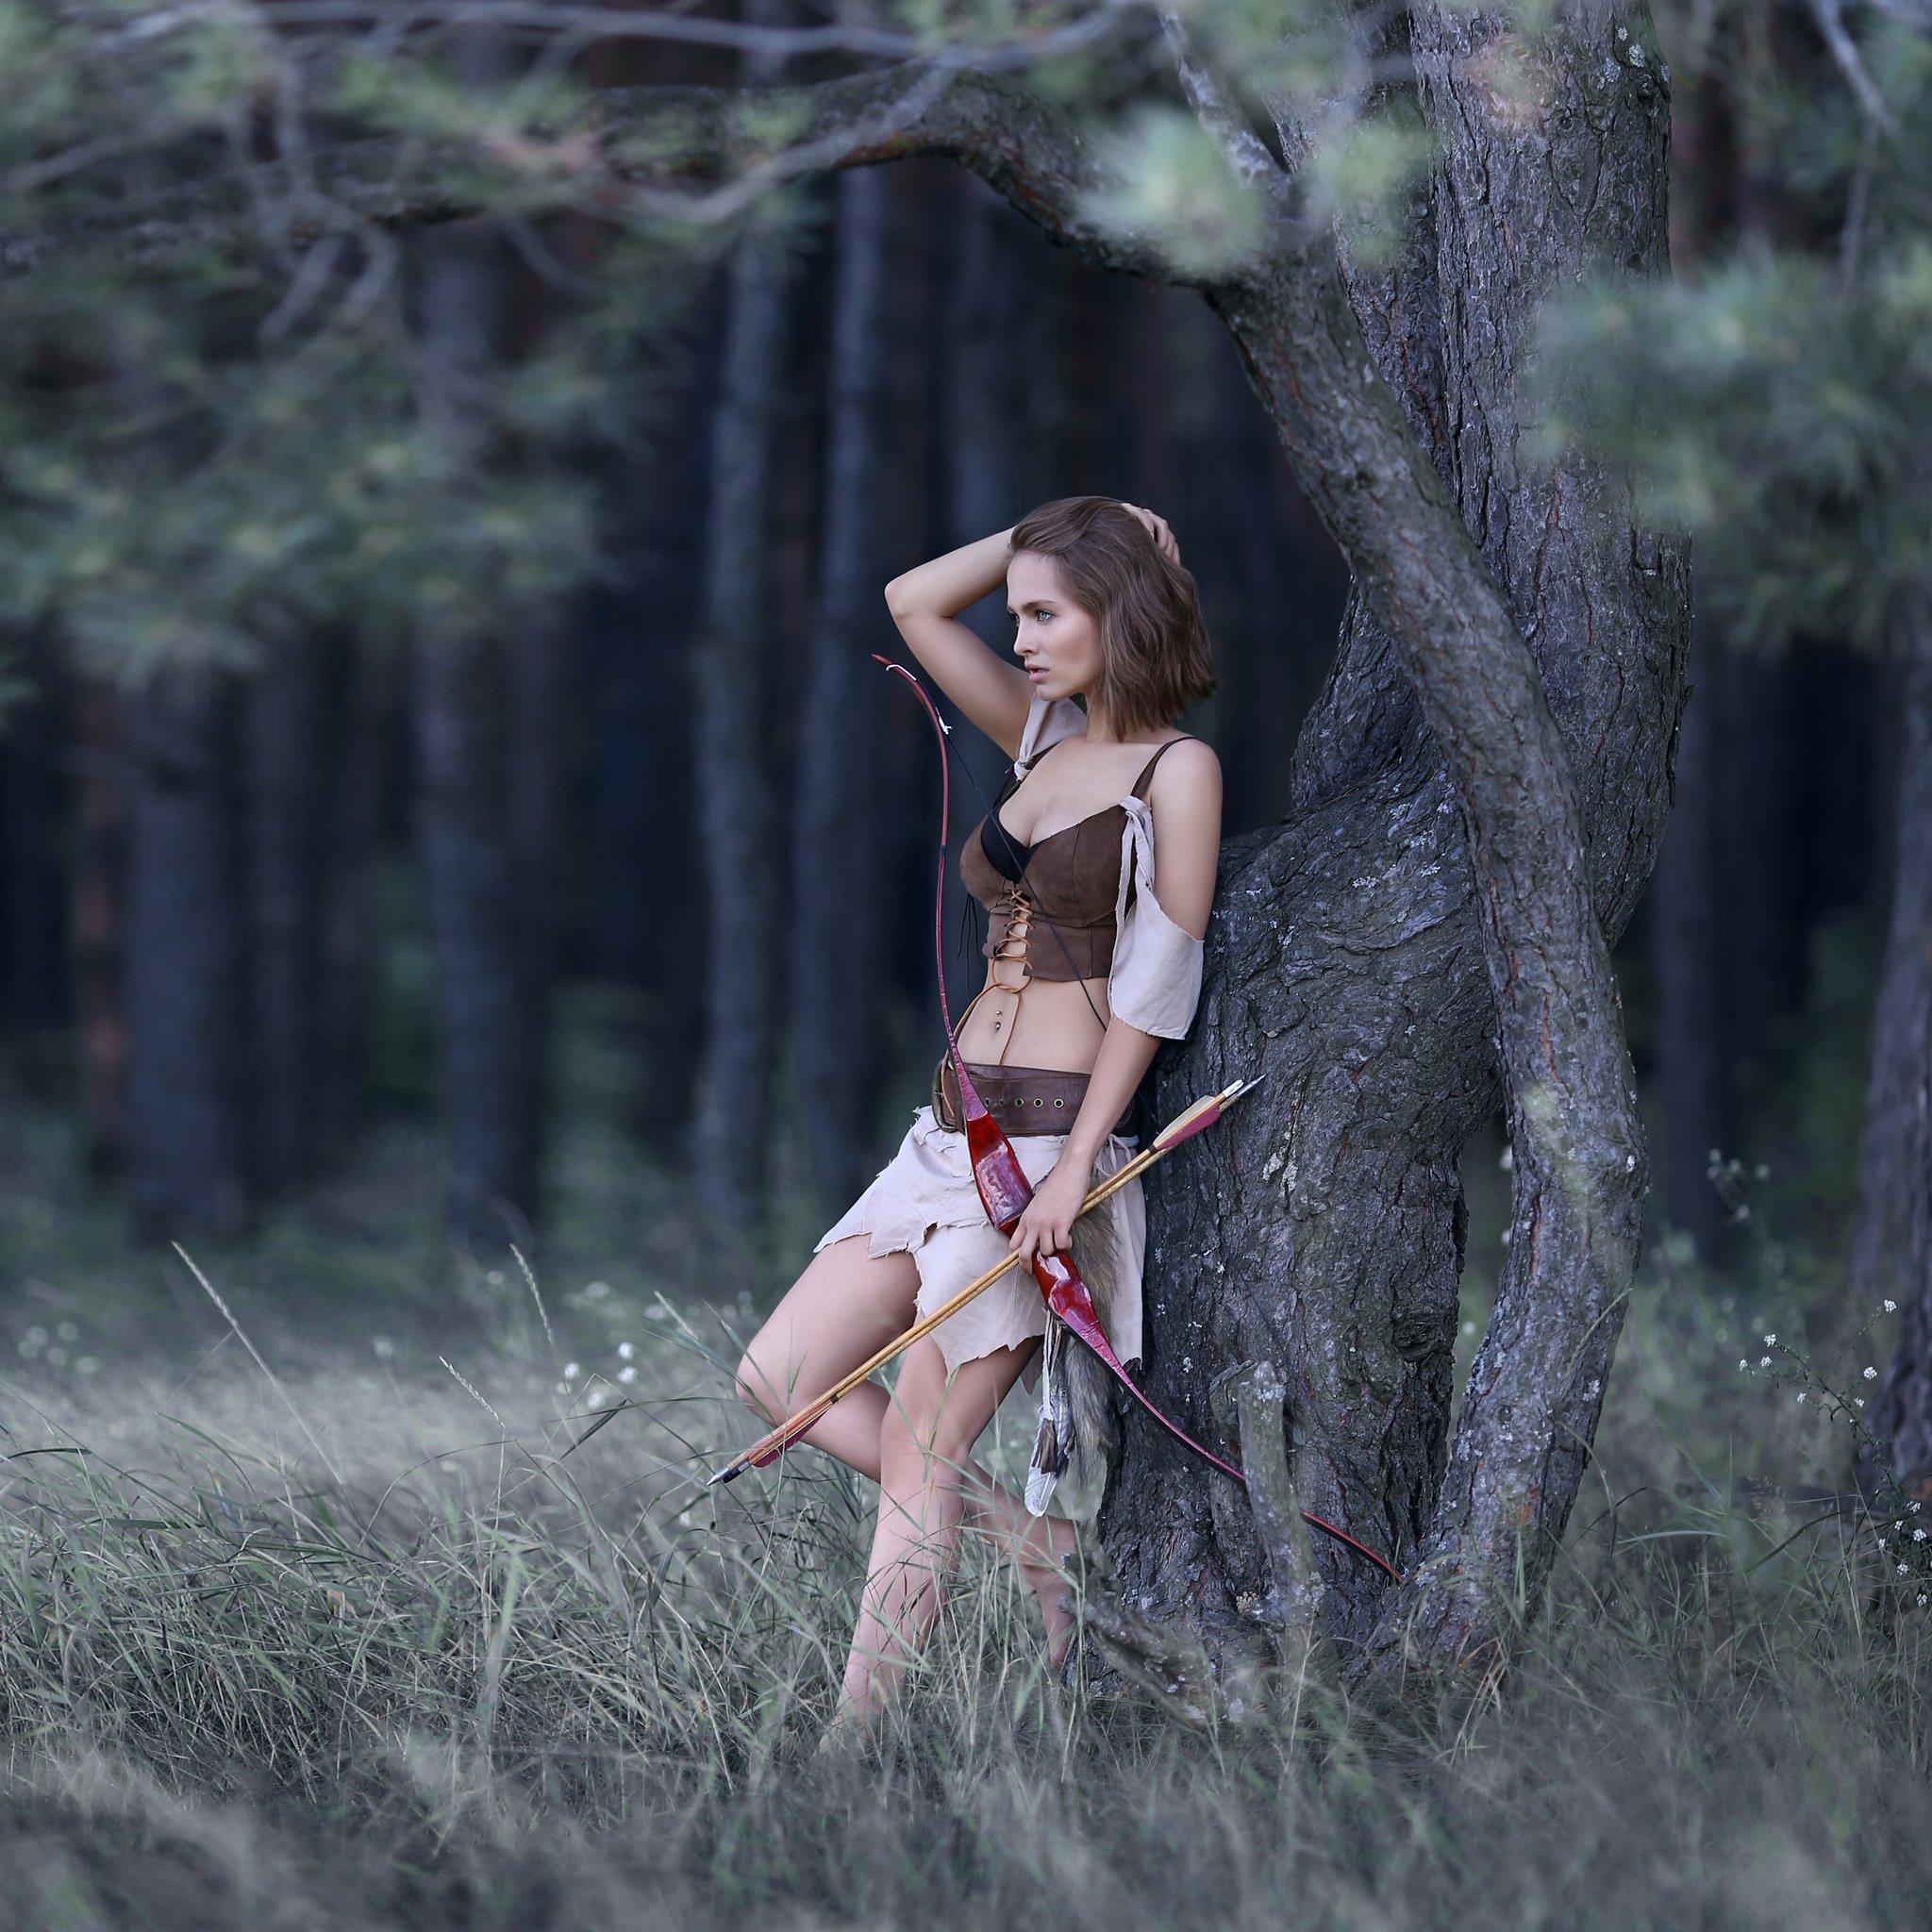 амазонка, охотница, дикарка, лук, стрелы, девушка с луком, воительница, Голубятникова Ирина